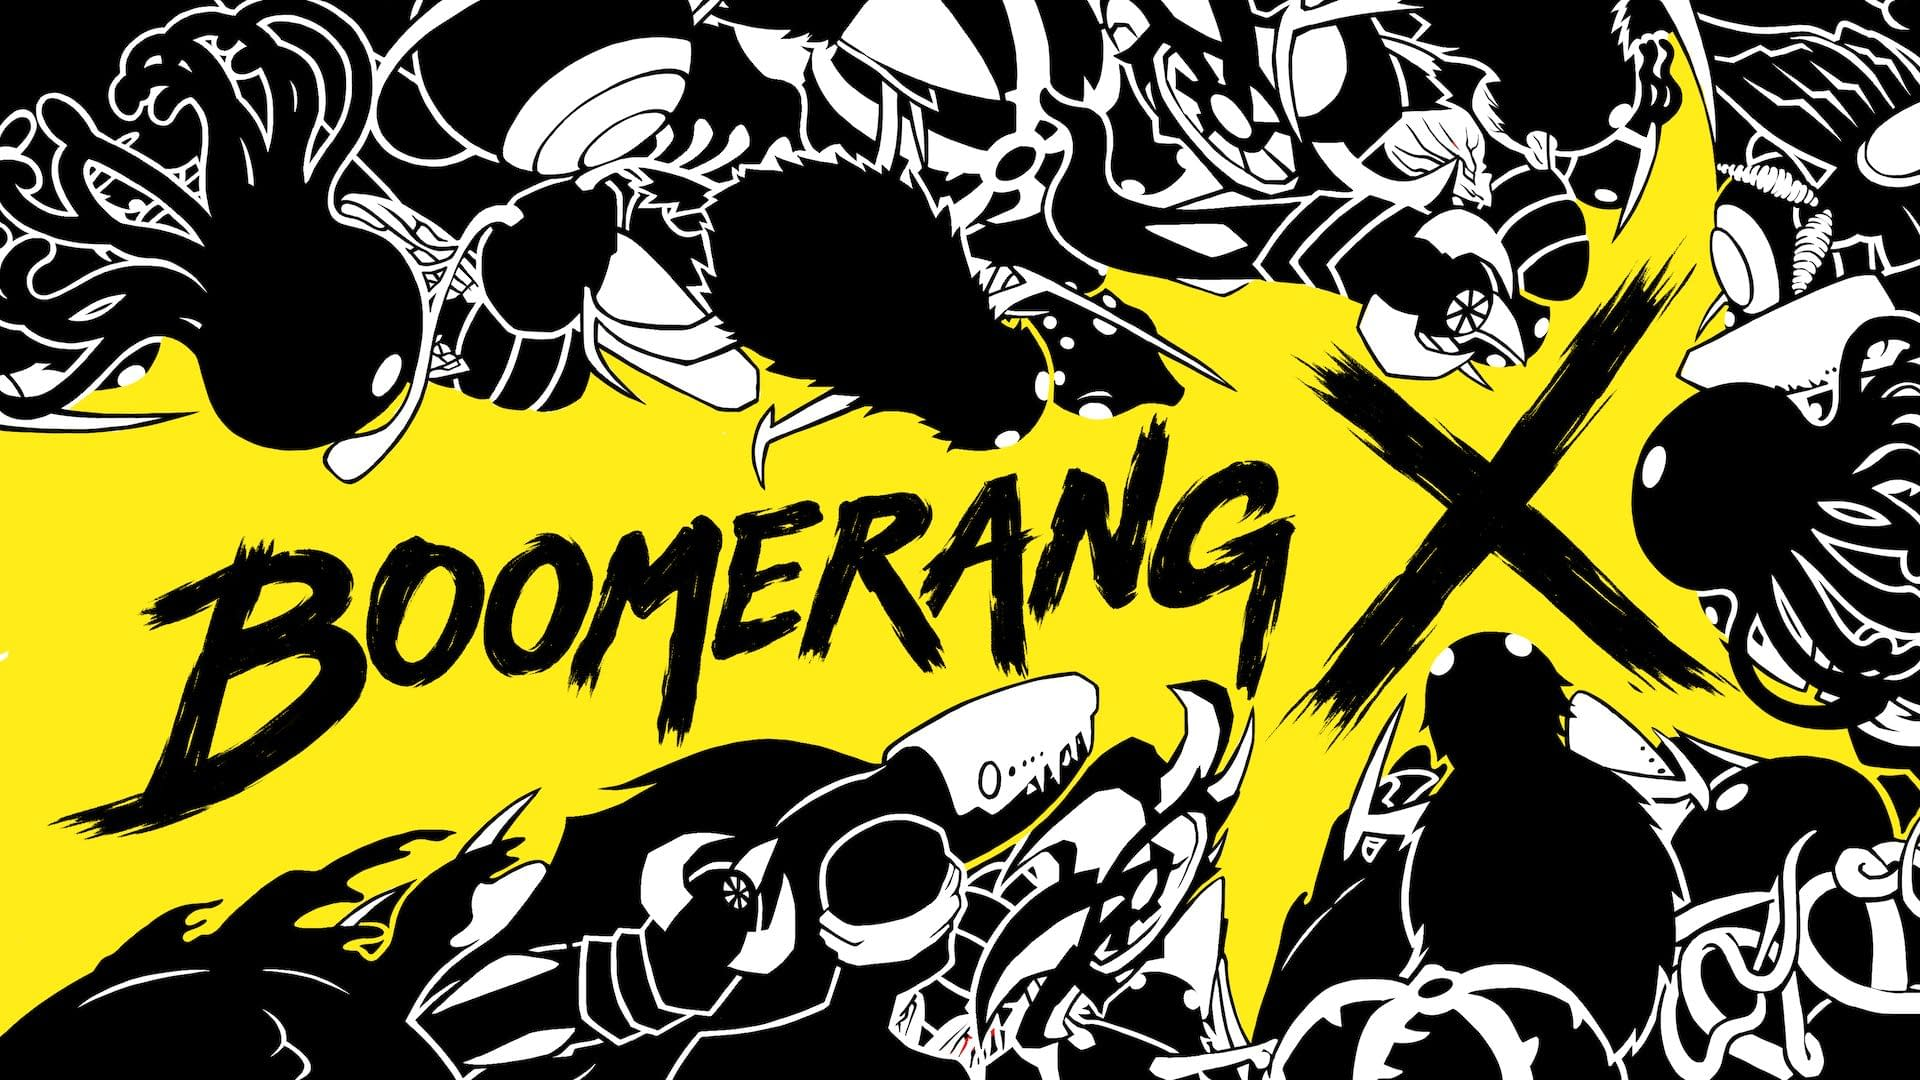 boomerang x logo wallpaper 75093